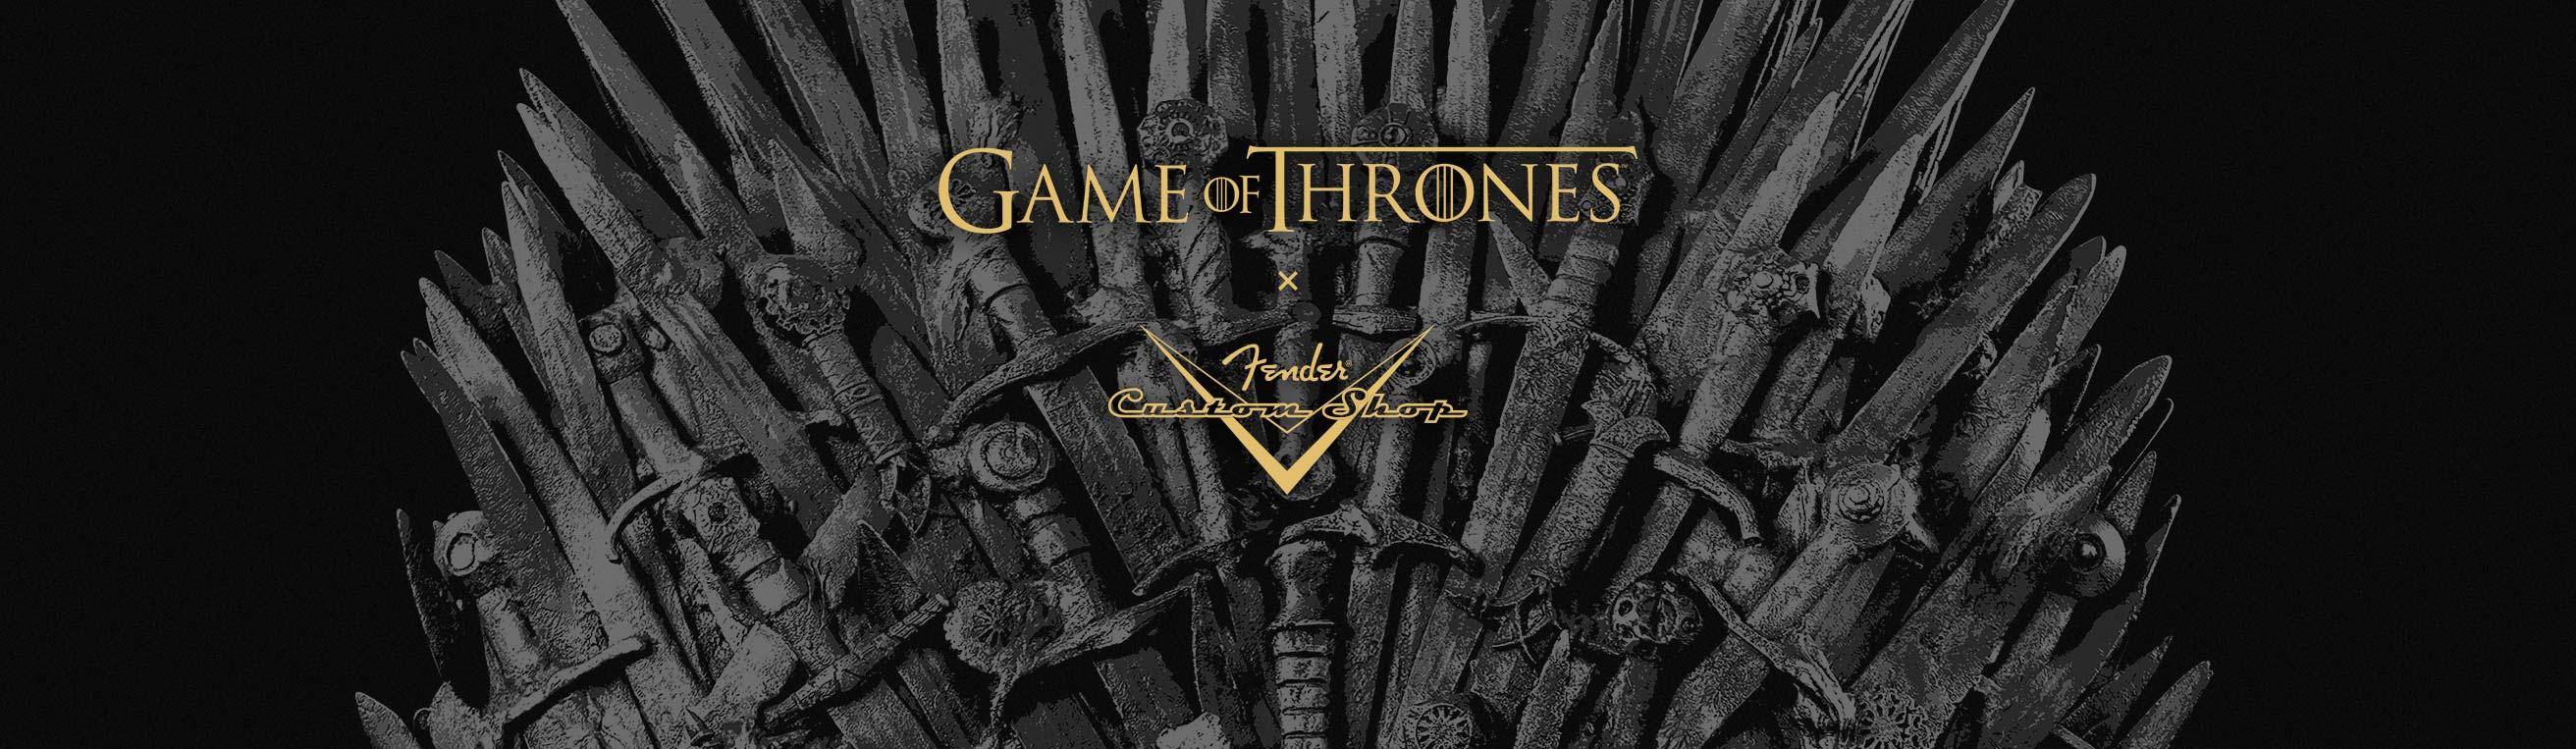 Fender Game of Thrones Sigil Collection | Fender Custom Shop